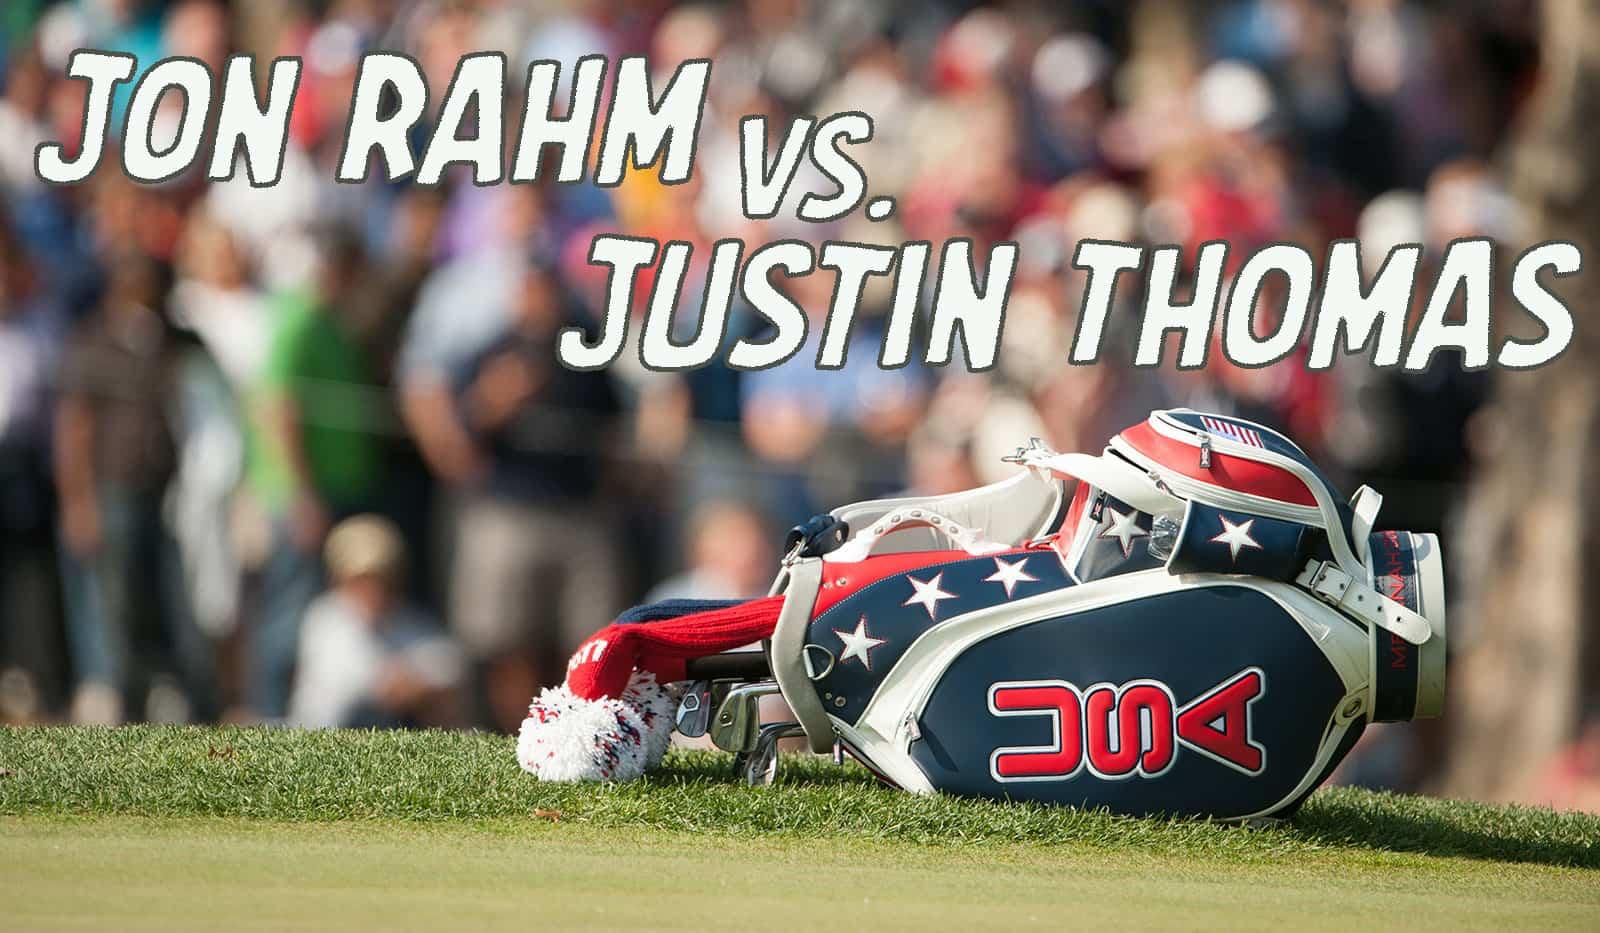 RyderCupMatchUp Rahm Thomas - Ryder Cup 2020 Match-Up: Jon Rahm vs. Justin Thomas